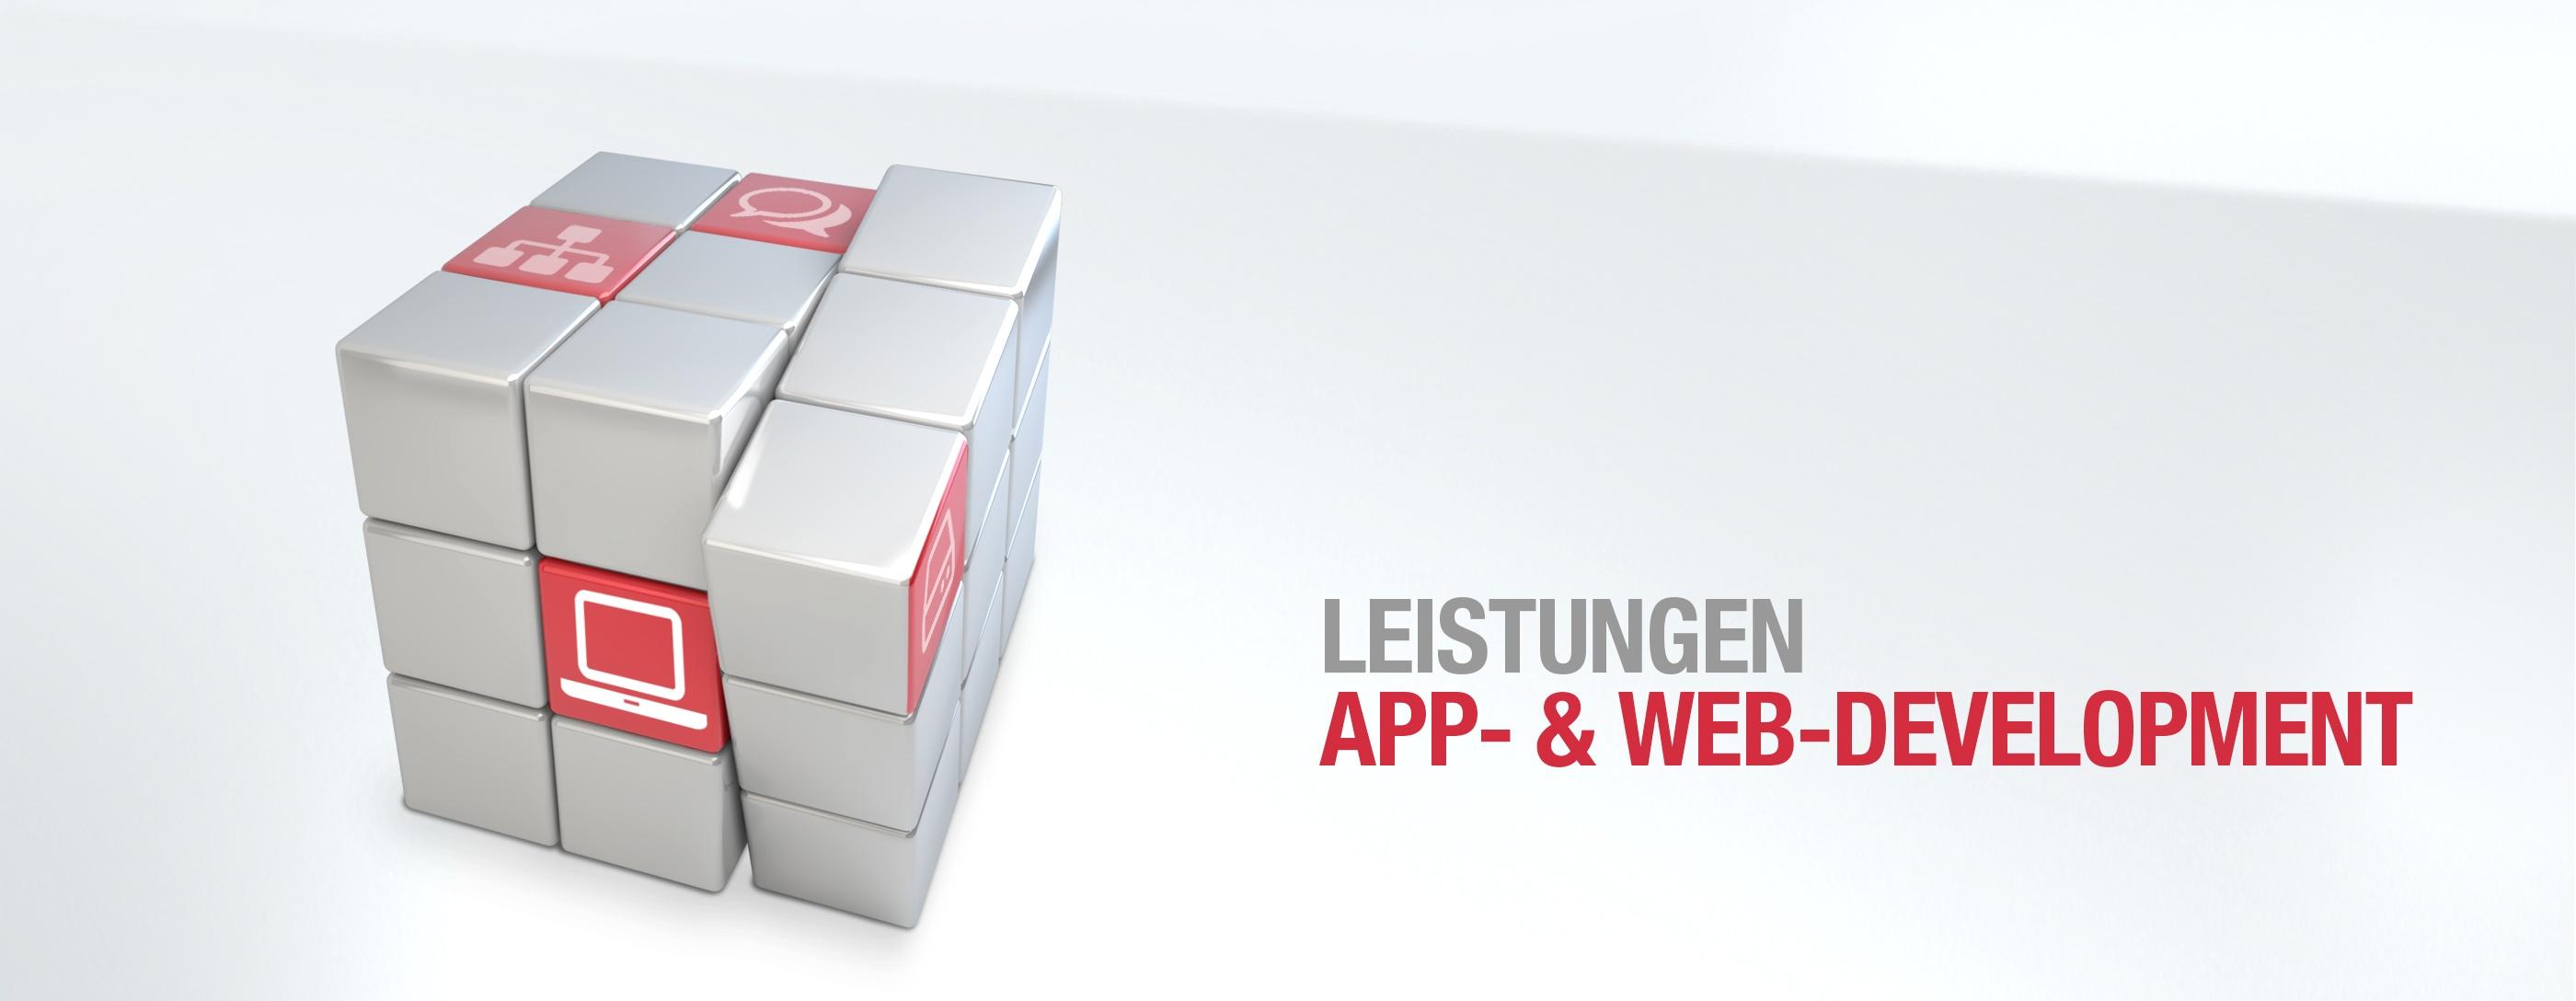 170830_leistungen_app_webdevelopment.jpg